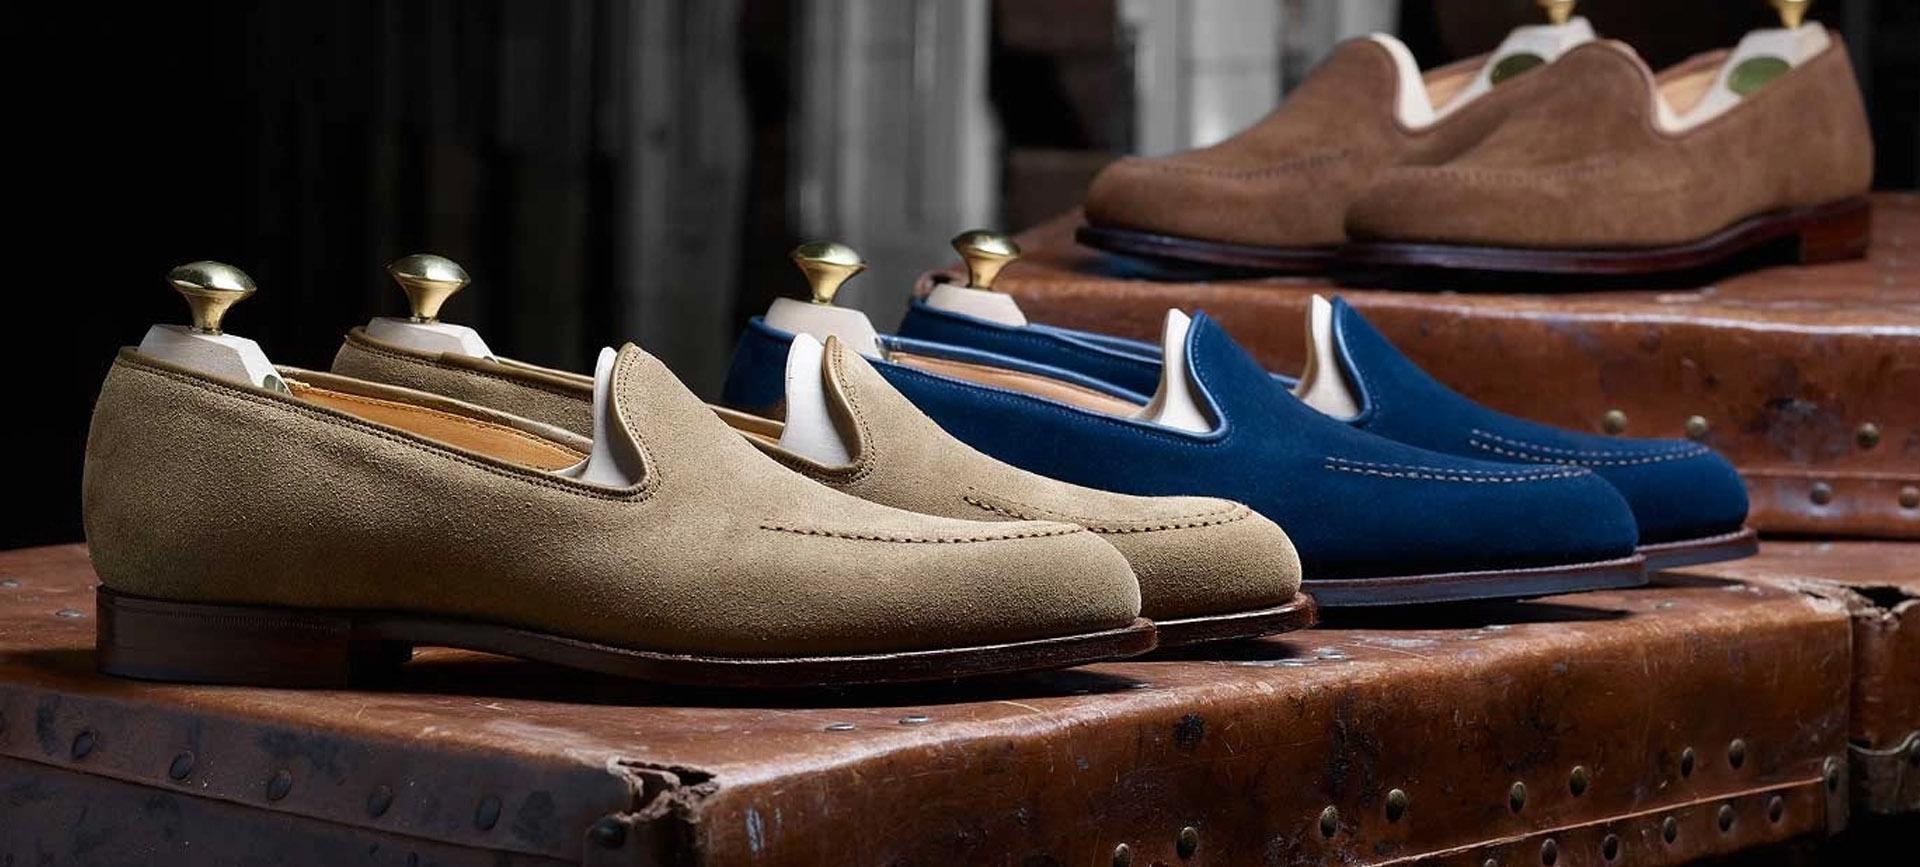 Crockett & Jones Handmade English Shoes